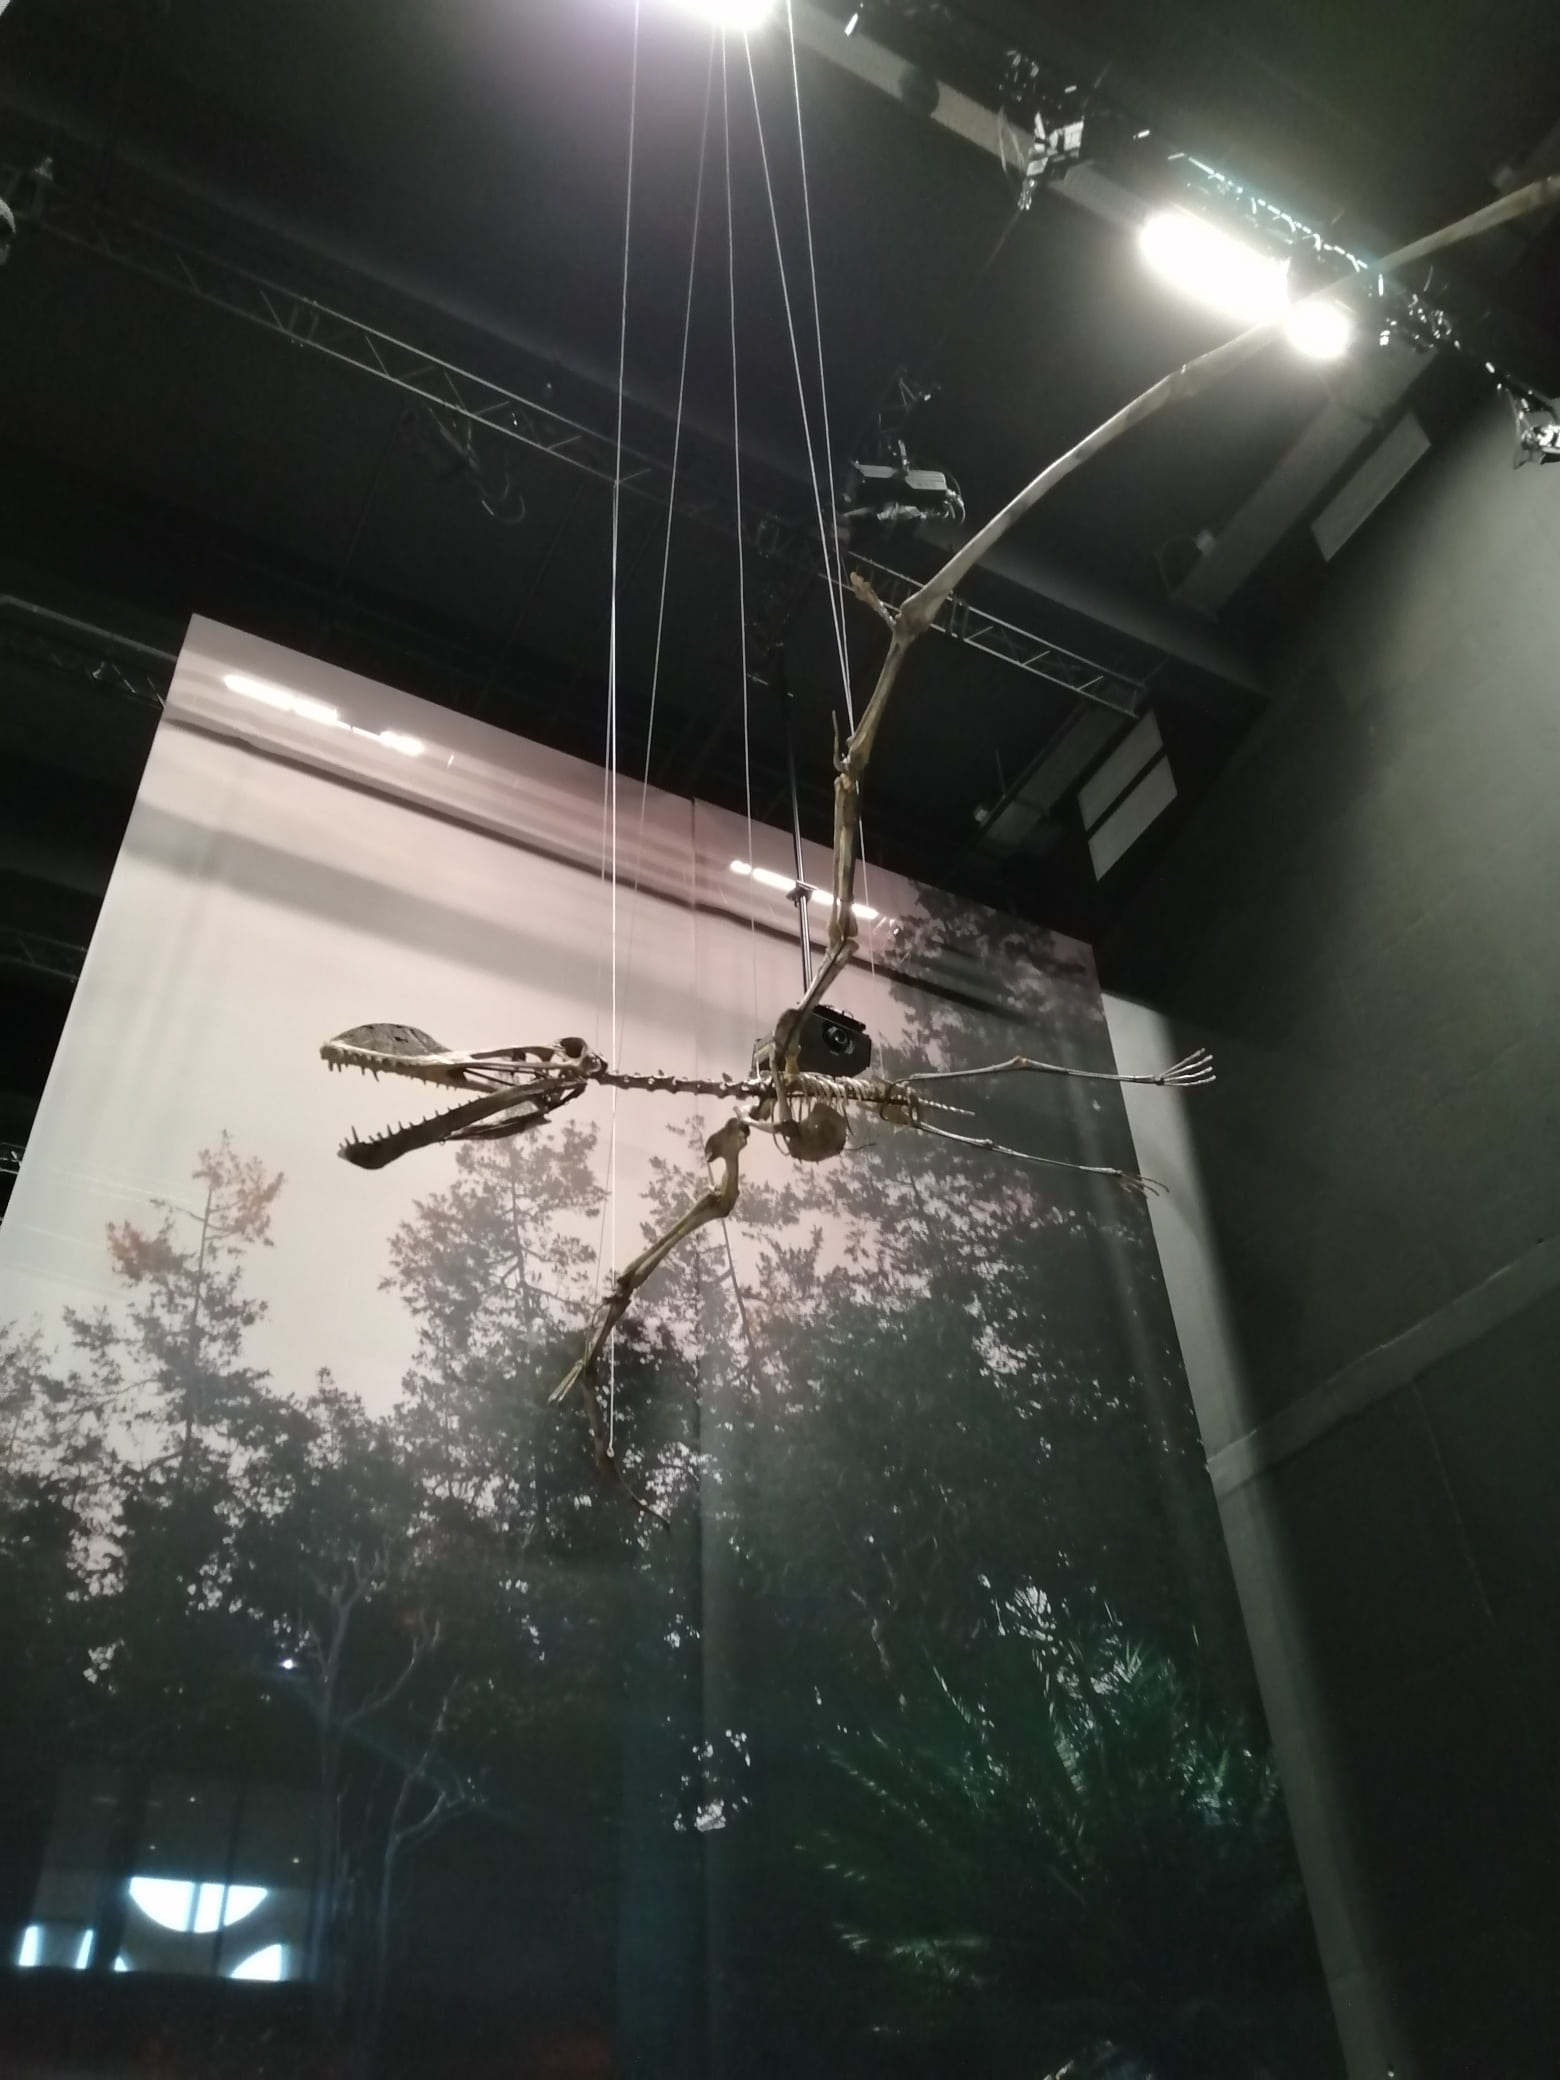 Fossielen & Dinosauriërs | oplevering Coloborhynchus skelet | Dinozaal - Naturalis Biodiversity Center